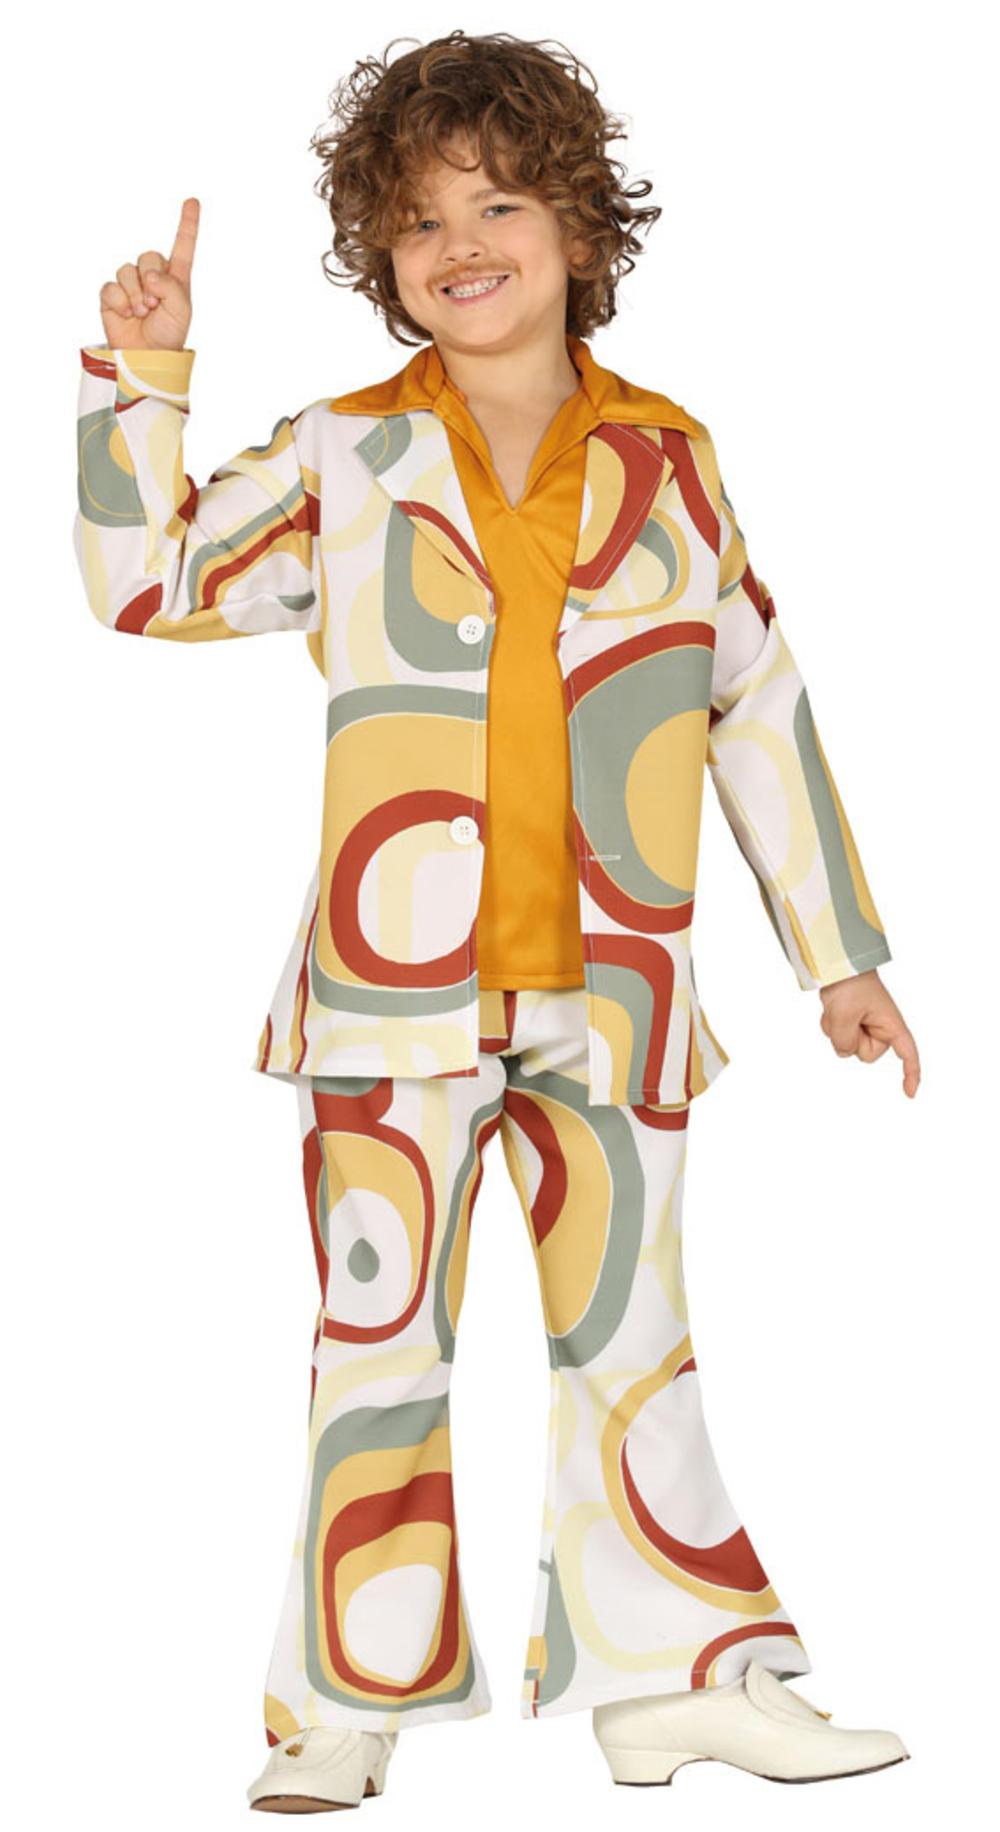 Groovy 70s Boy Kids Fancy Dress Funky Retro Disco 1970s Kids Boys Costume Outfit